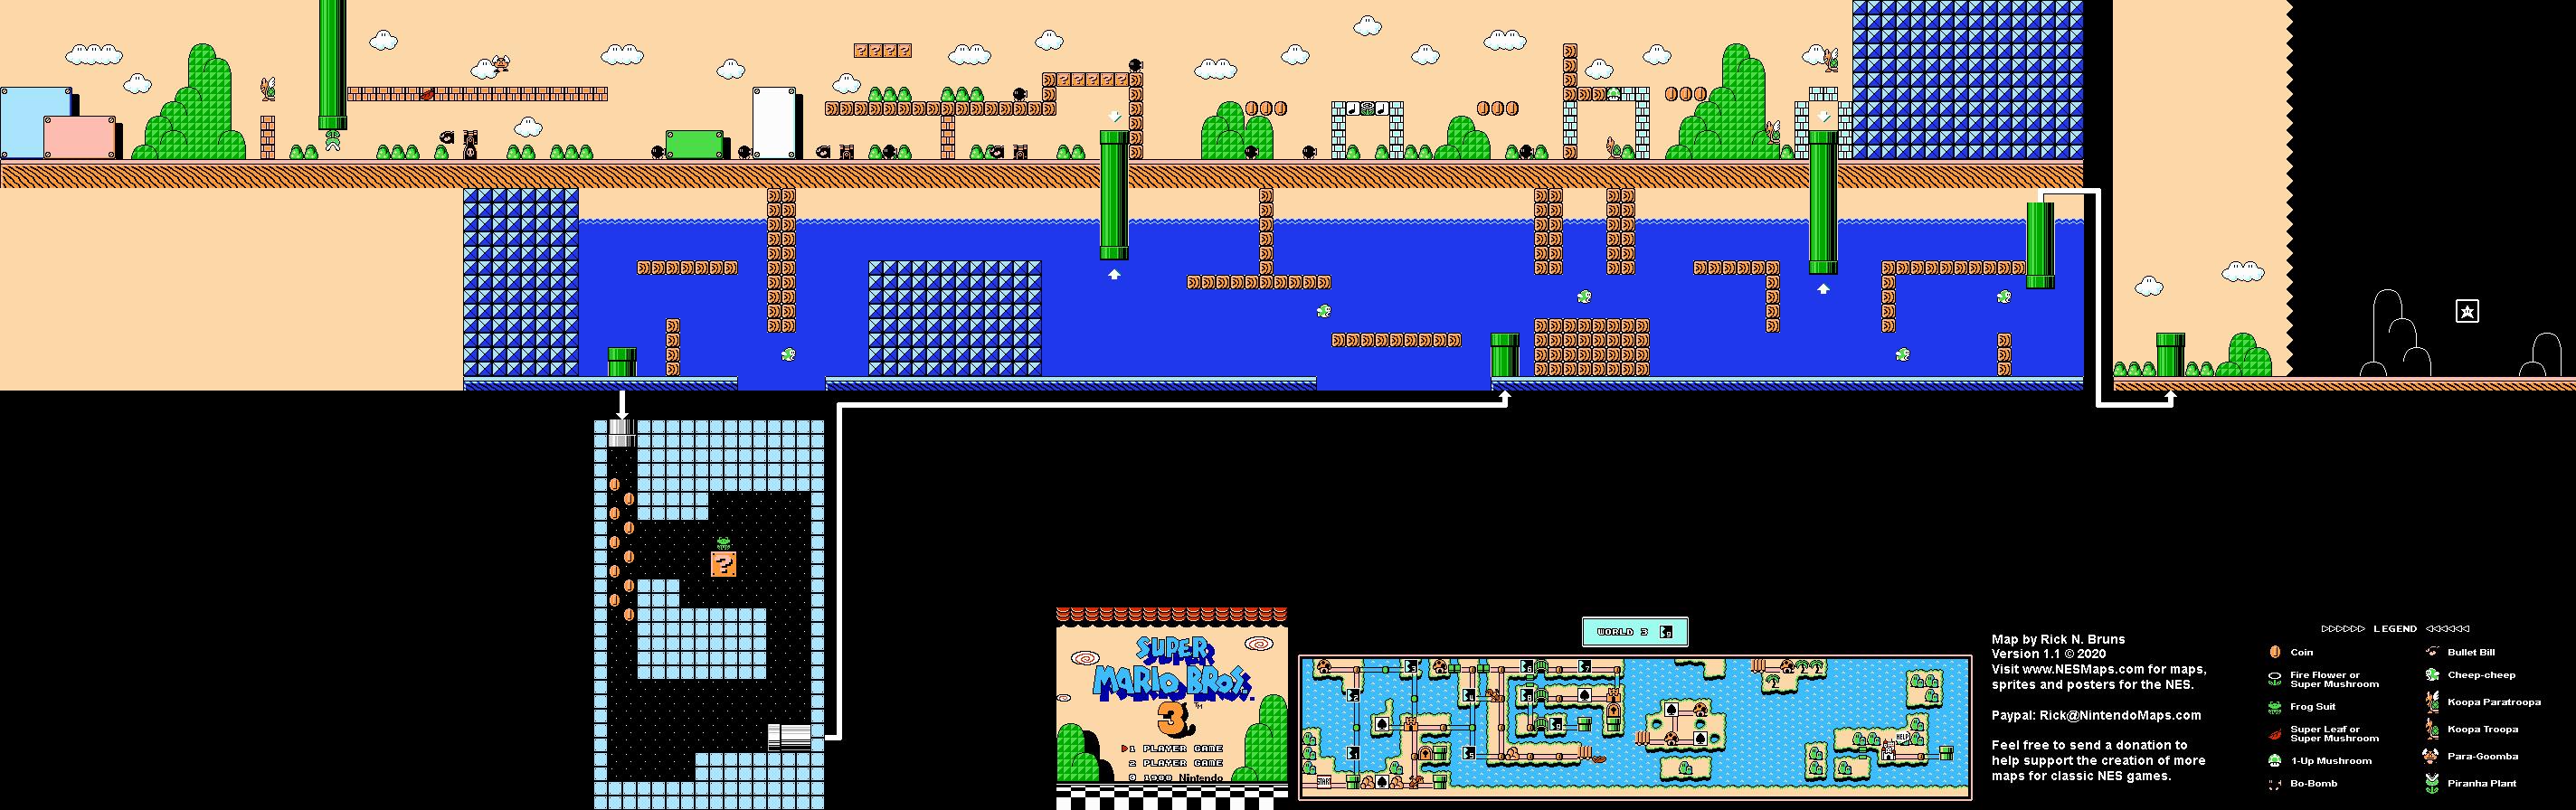 Super Mario Brothers 3 World 3 9 Nintendo Nes Map